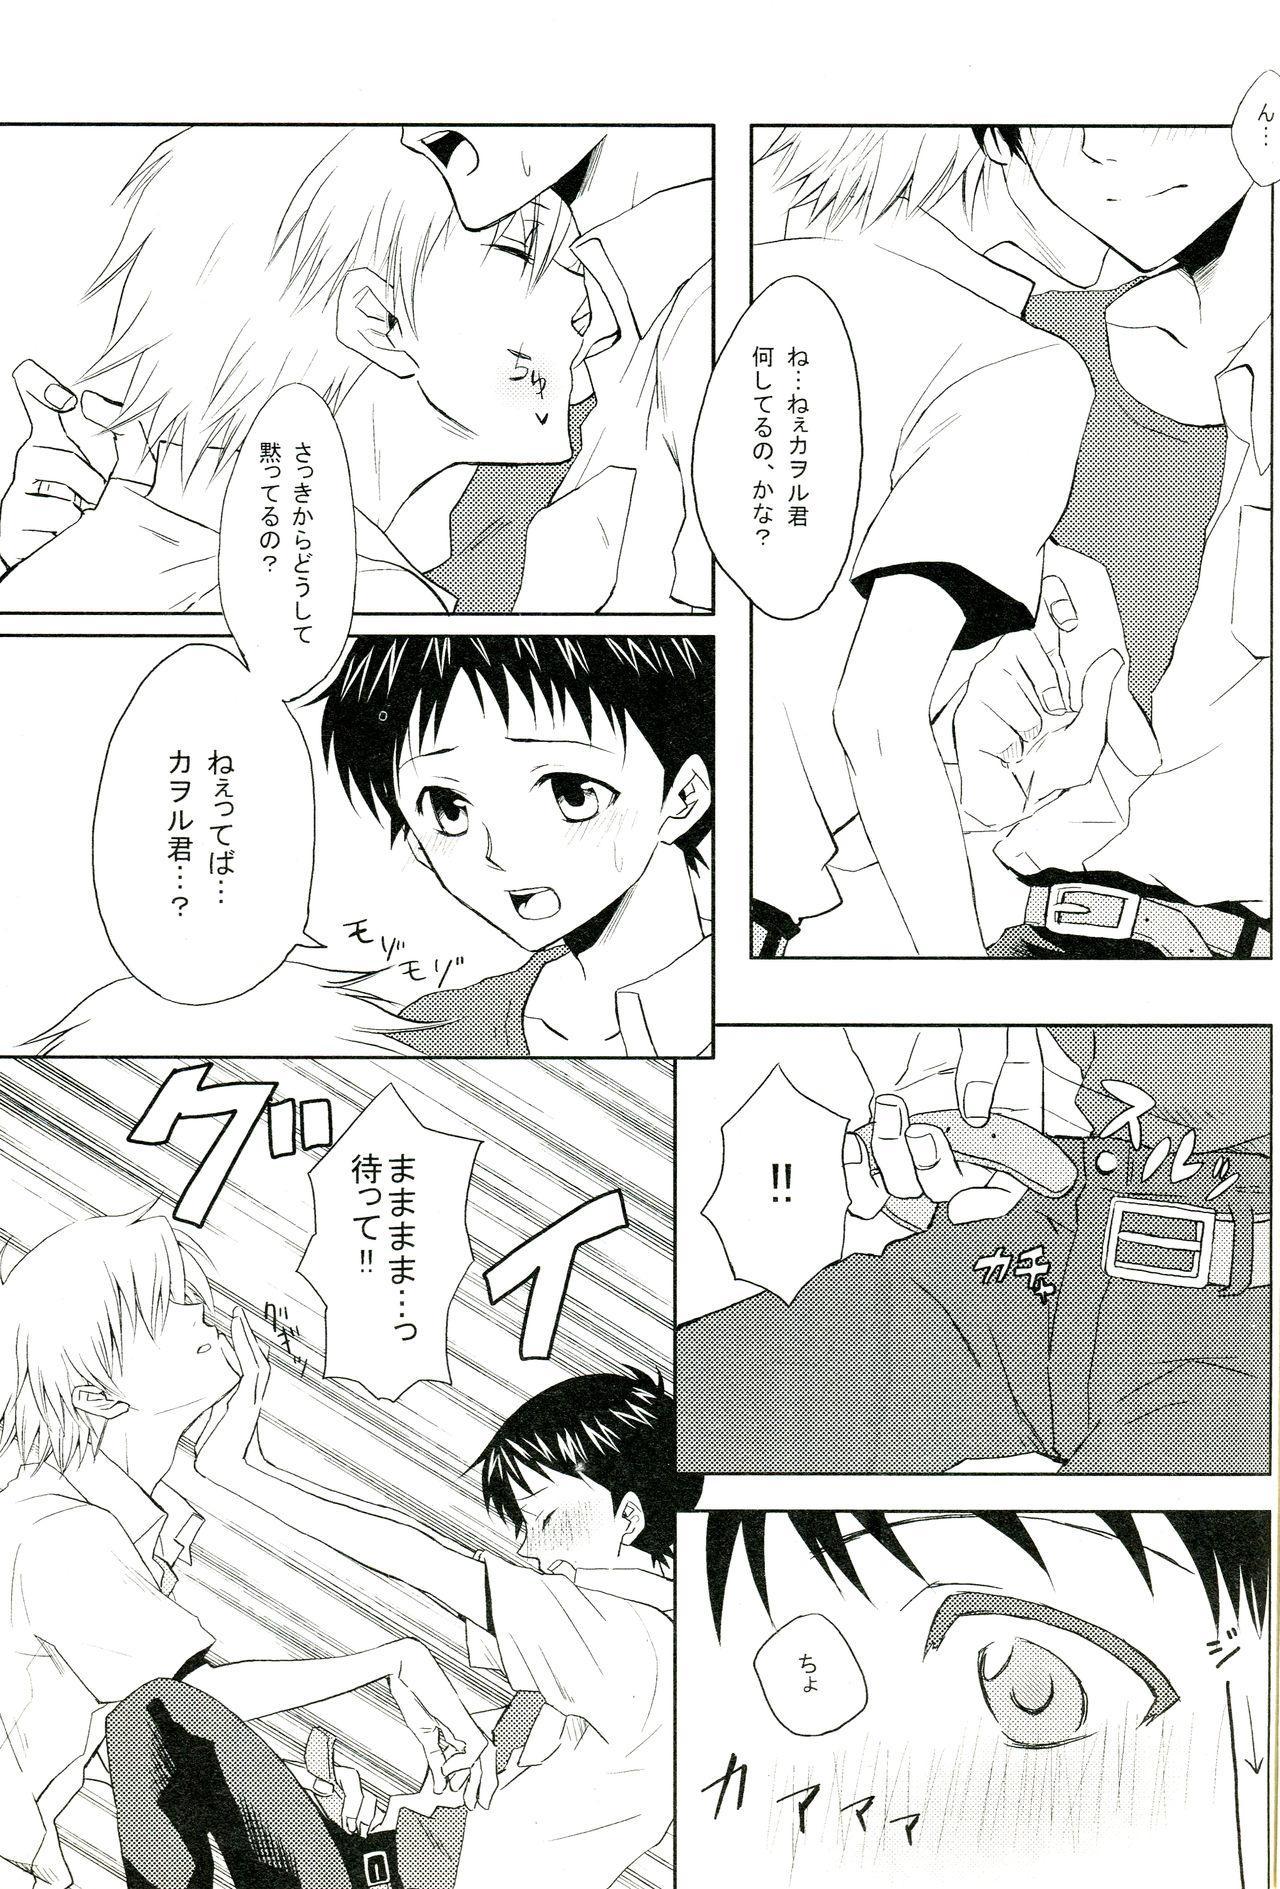 PSP Eva 2 no Susume 3